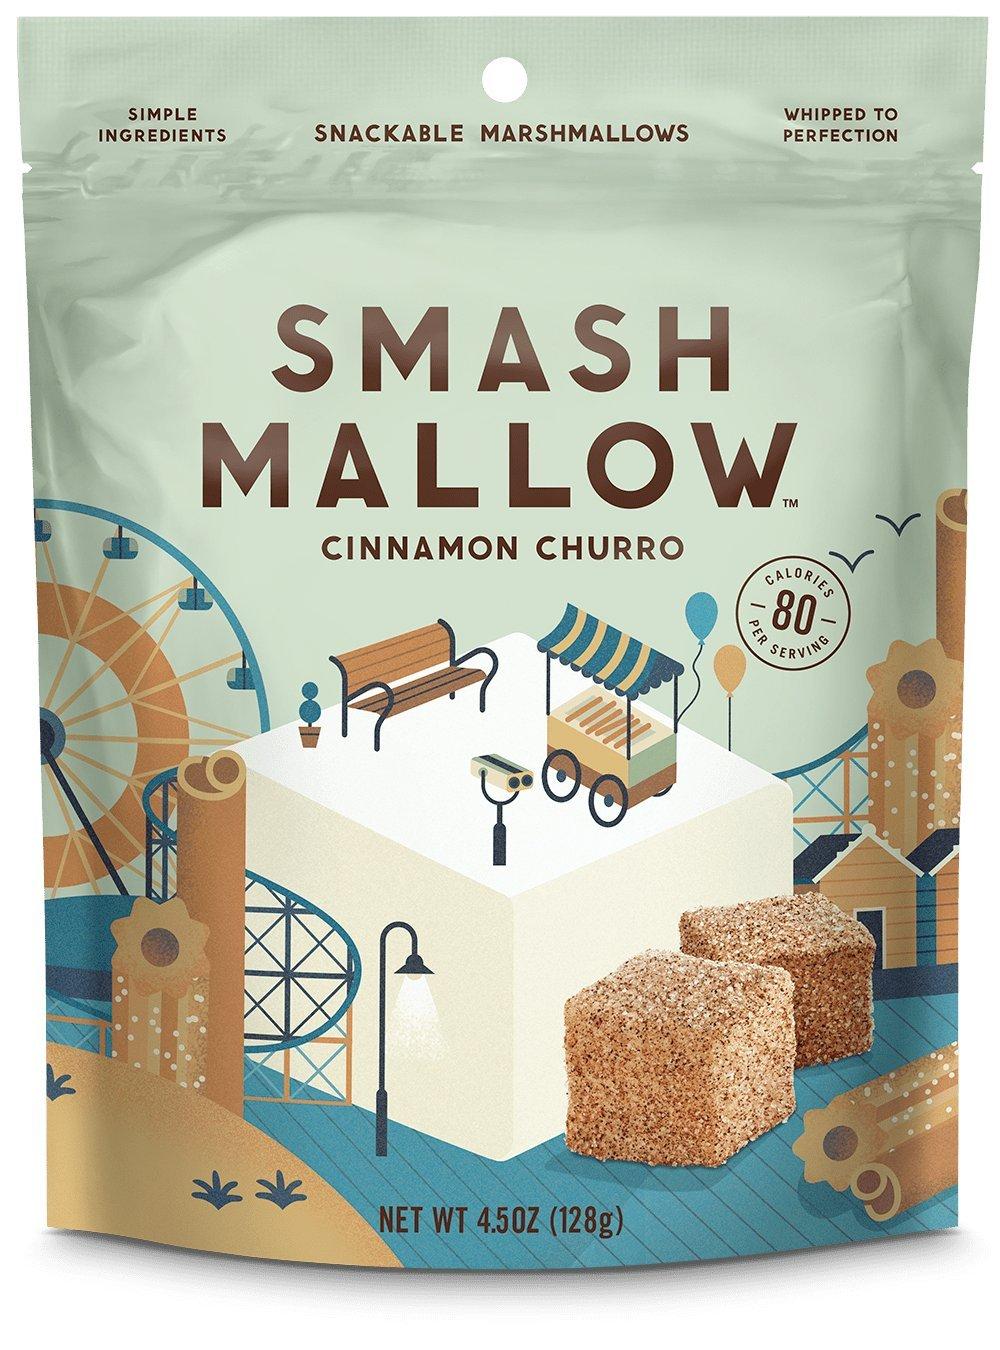 Smash Mallow Snackable Marshmallows Cinnamon Churro 4.5 oz (Pack of 4) by Smash Mallow